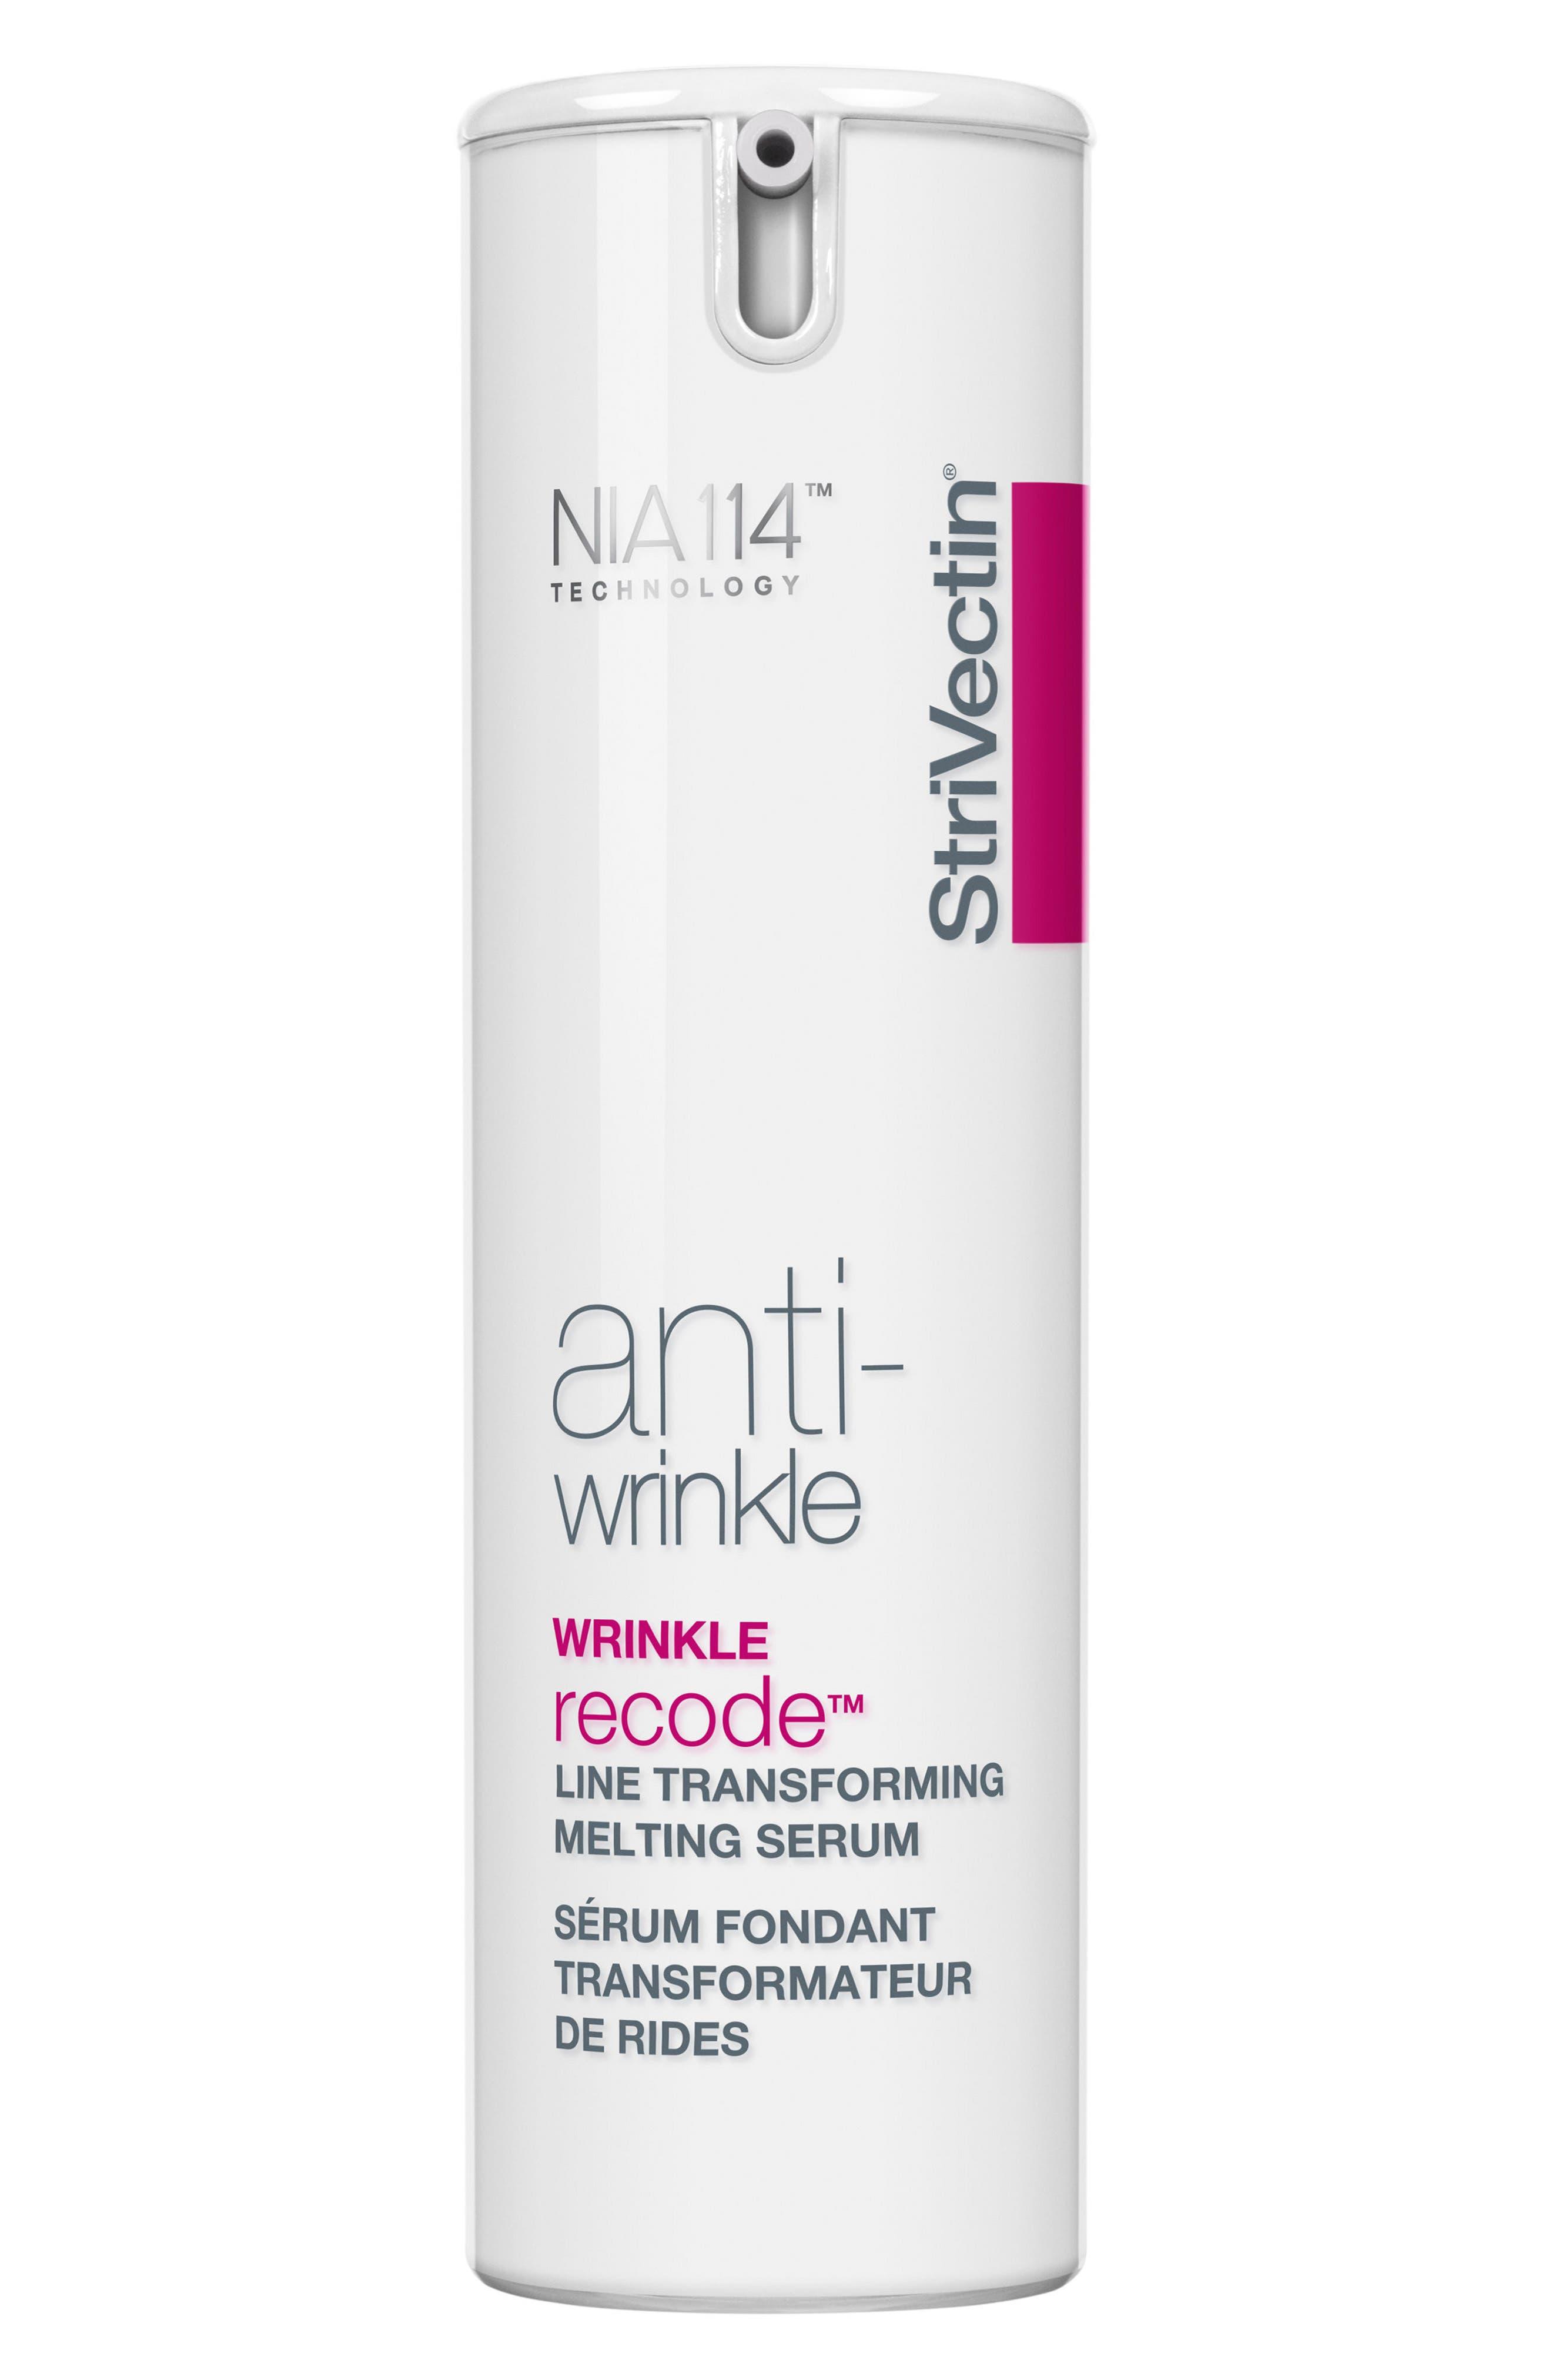 Wrinkle Recode Line Transforming Melting Serum,                             Main thumbnail 1, color,                             No Color